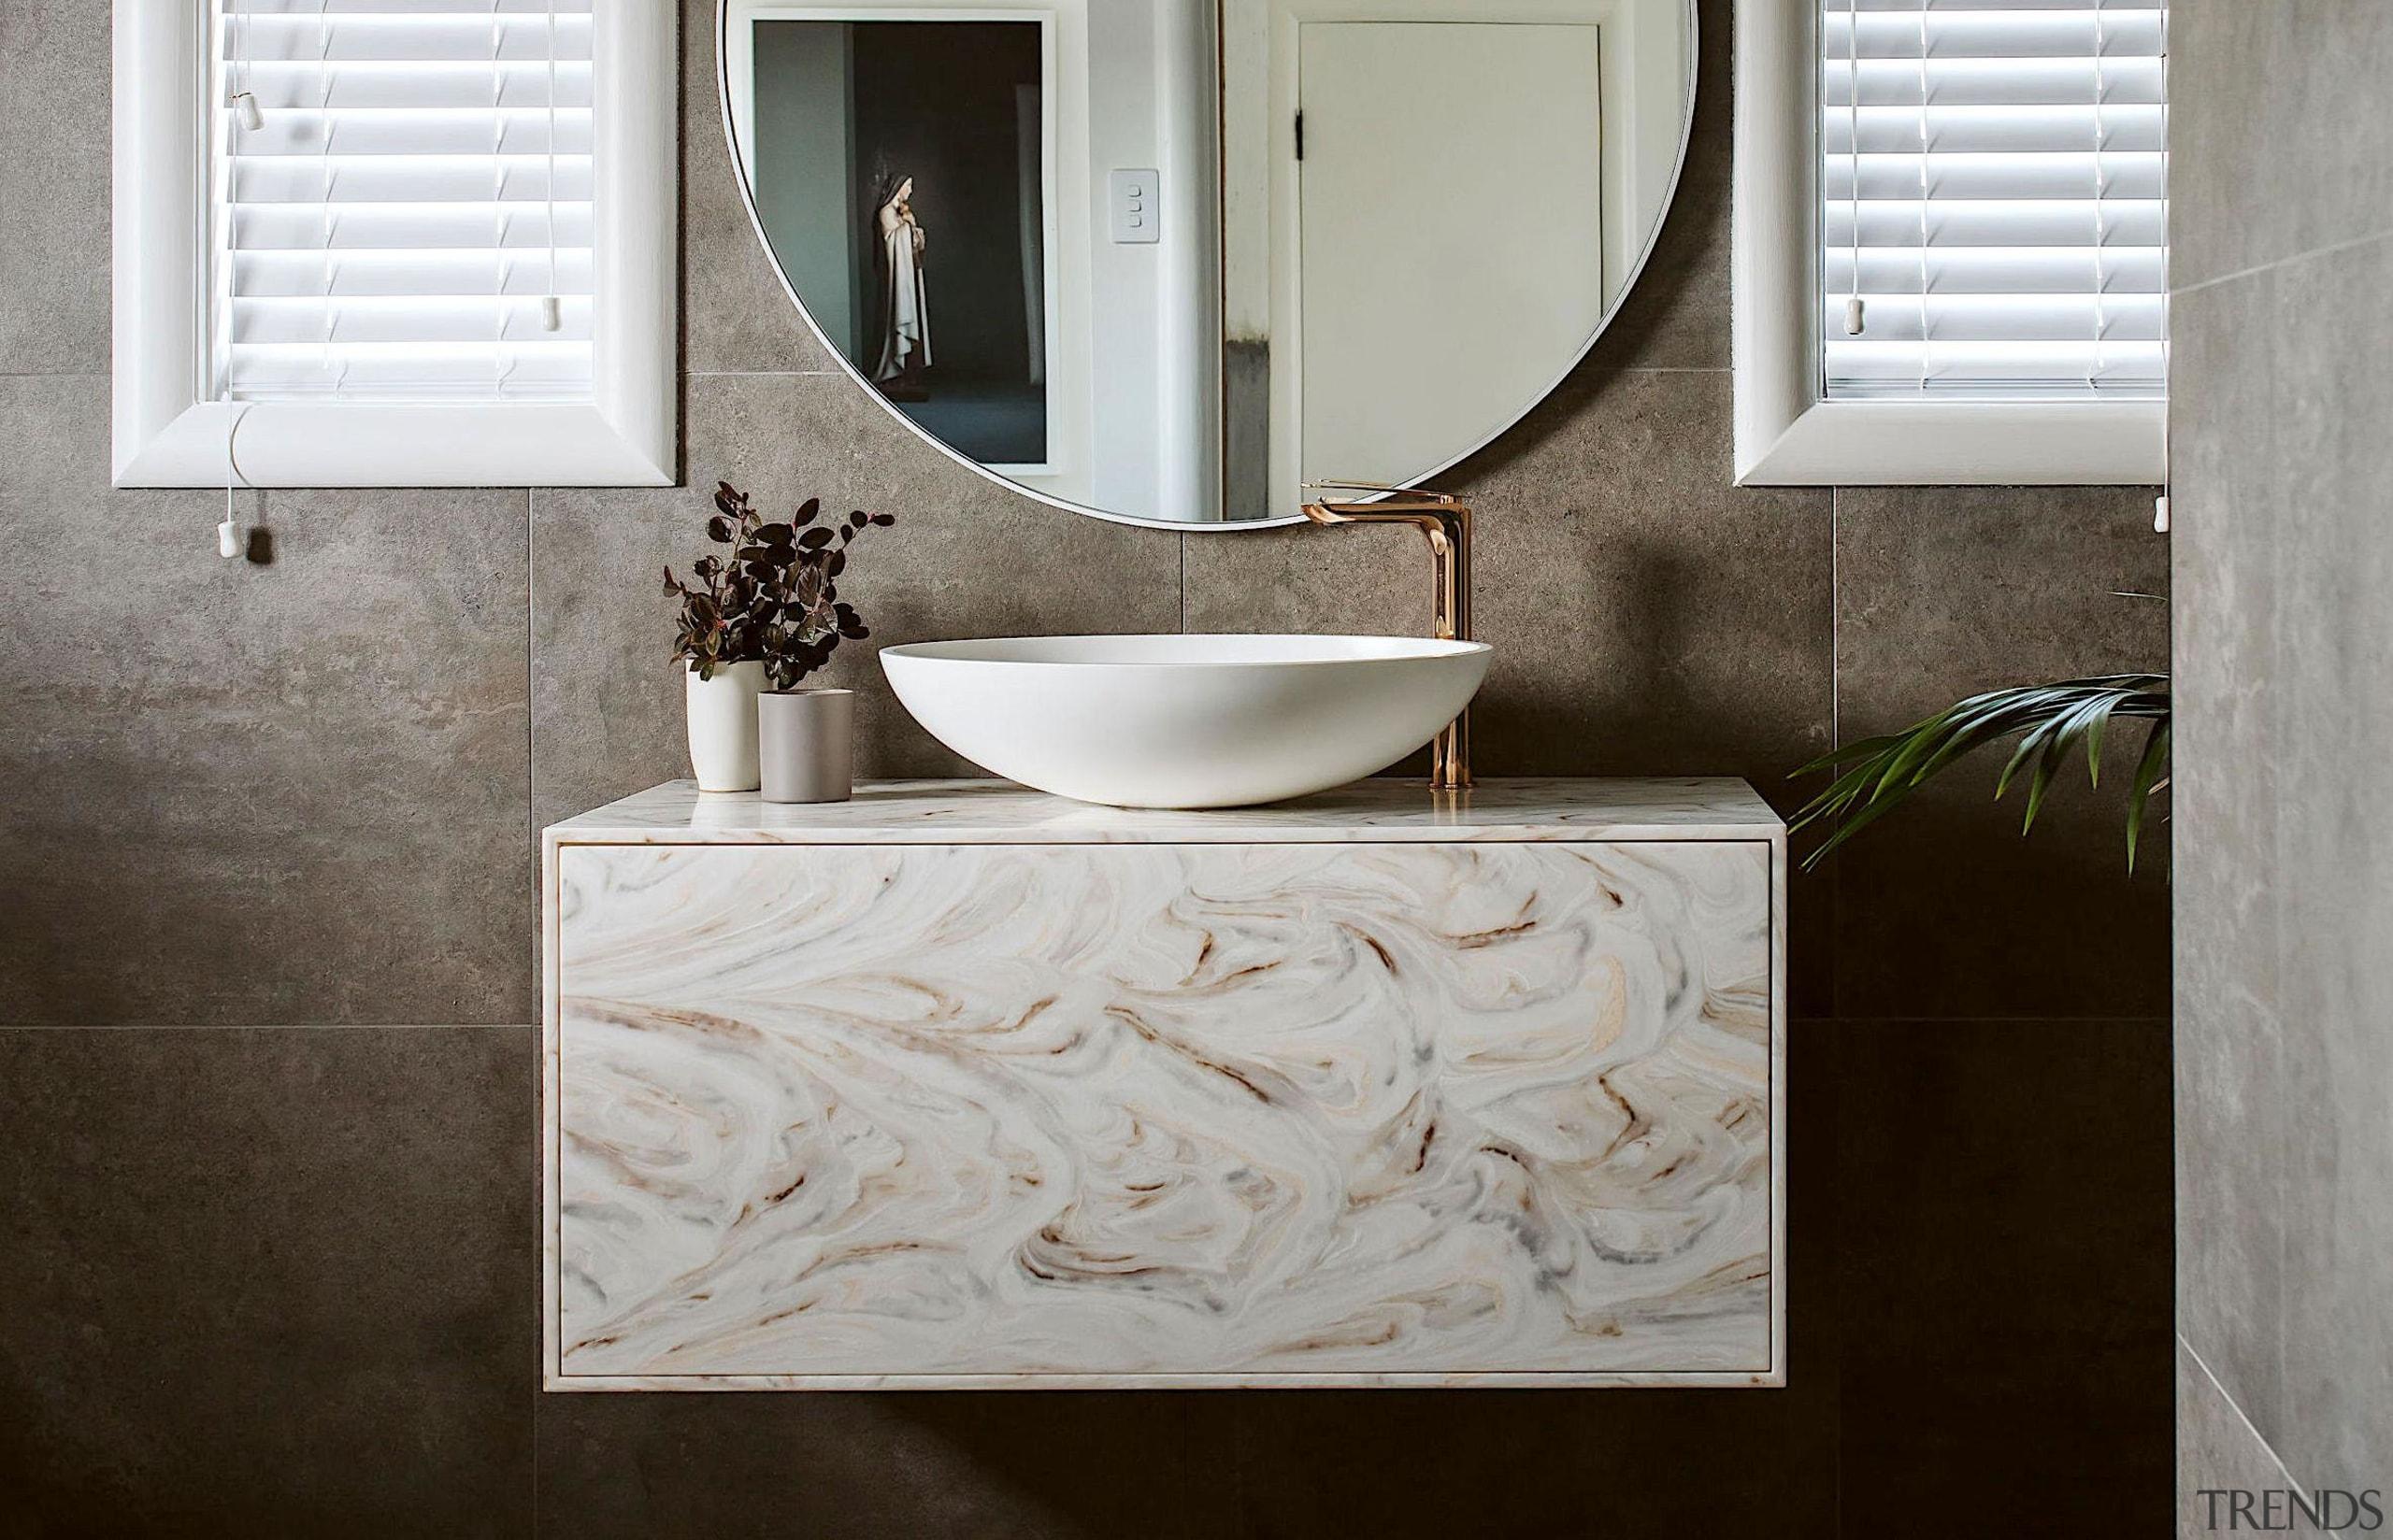 Annika Rowson – Highly Commended – 2019 TIDA architecture, bathroom, bathroom accessory, bathroom sink, bathtub, ceramic, floor, flooring, home, interior design, limestone, marble, material property, plumbing fixture, property, room, sink, tap, tile, wall, gray, black